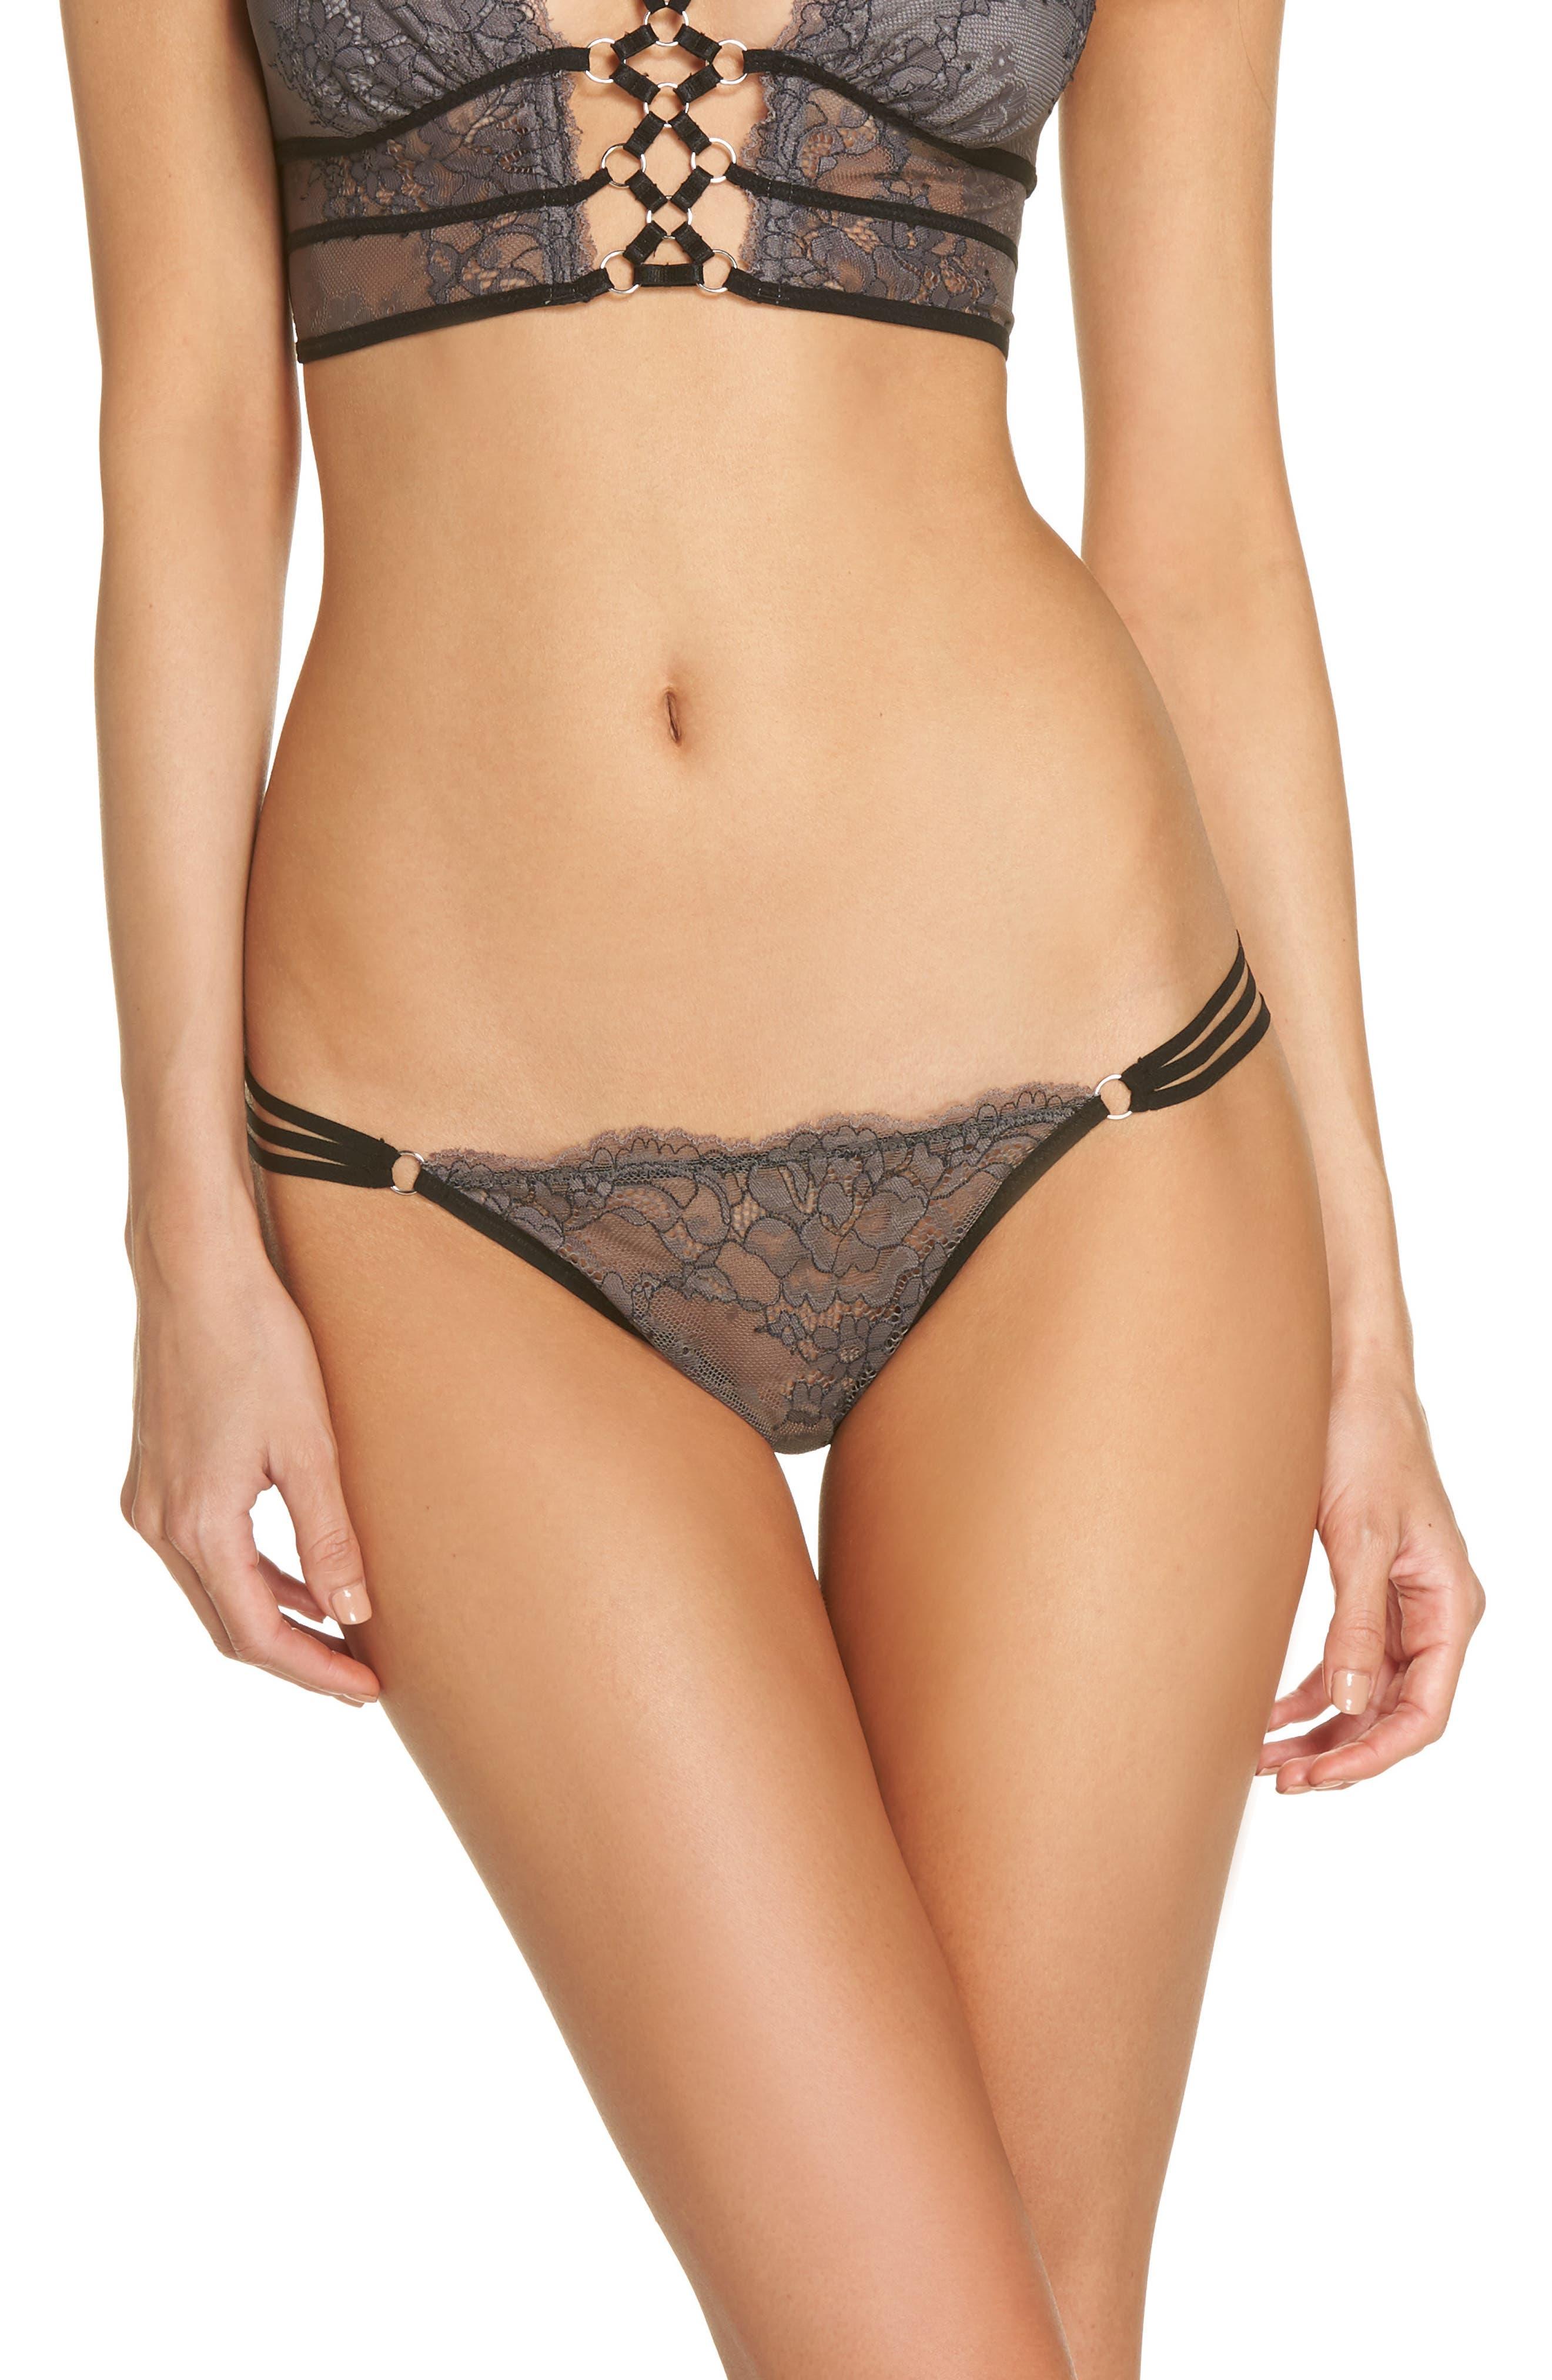 Thistle & Spire Constellation Lace Bikini,                         Main,                         color, Steel